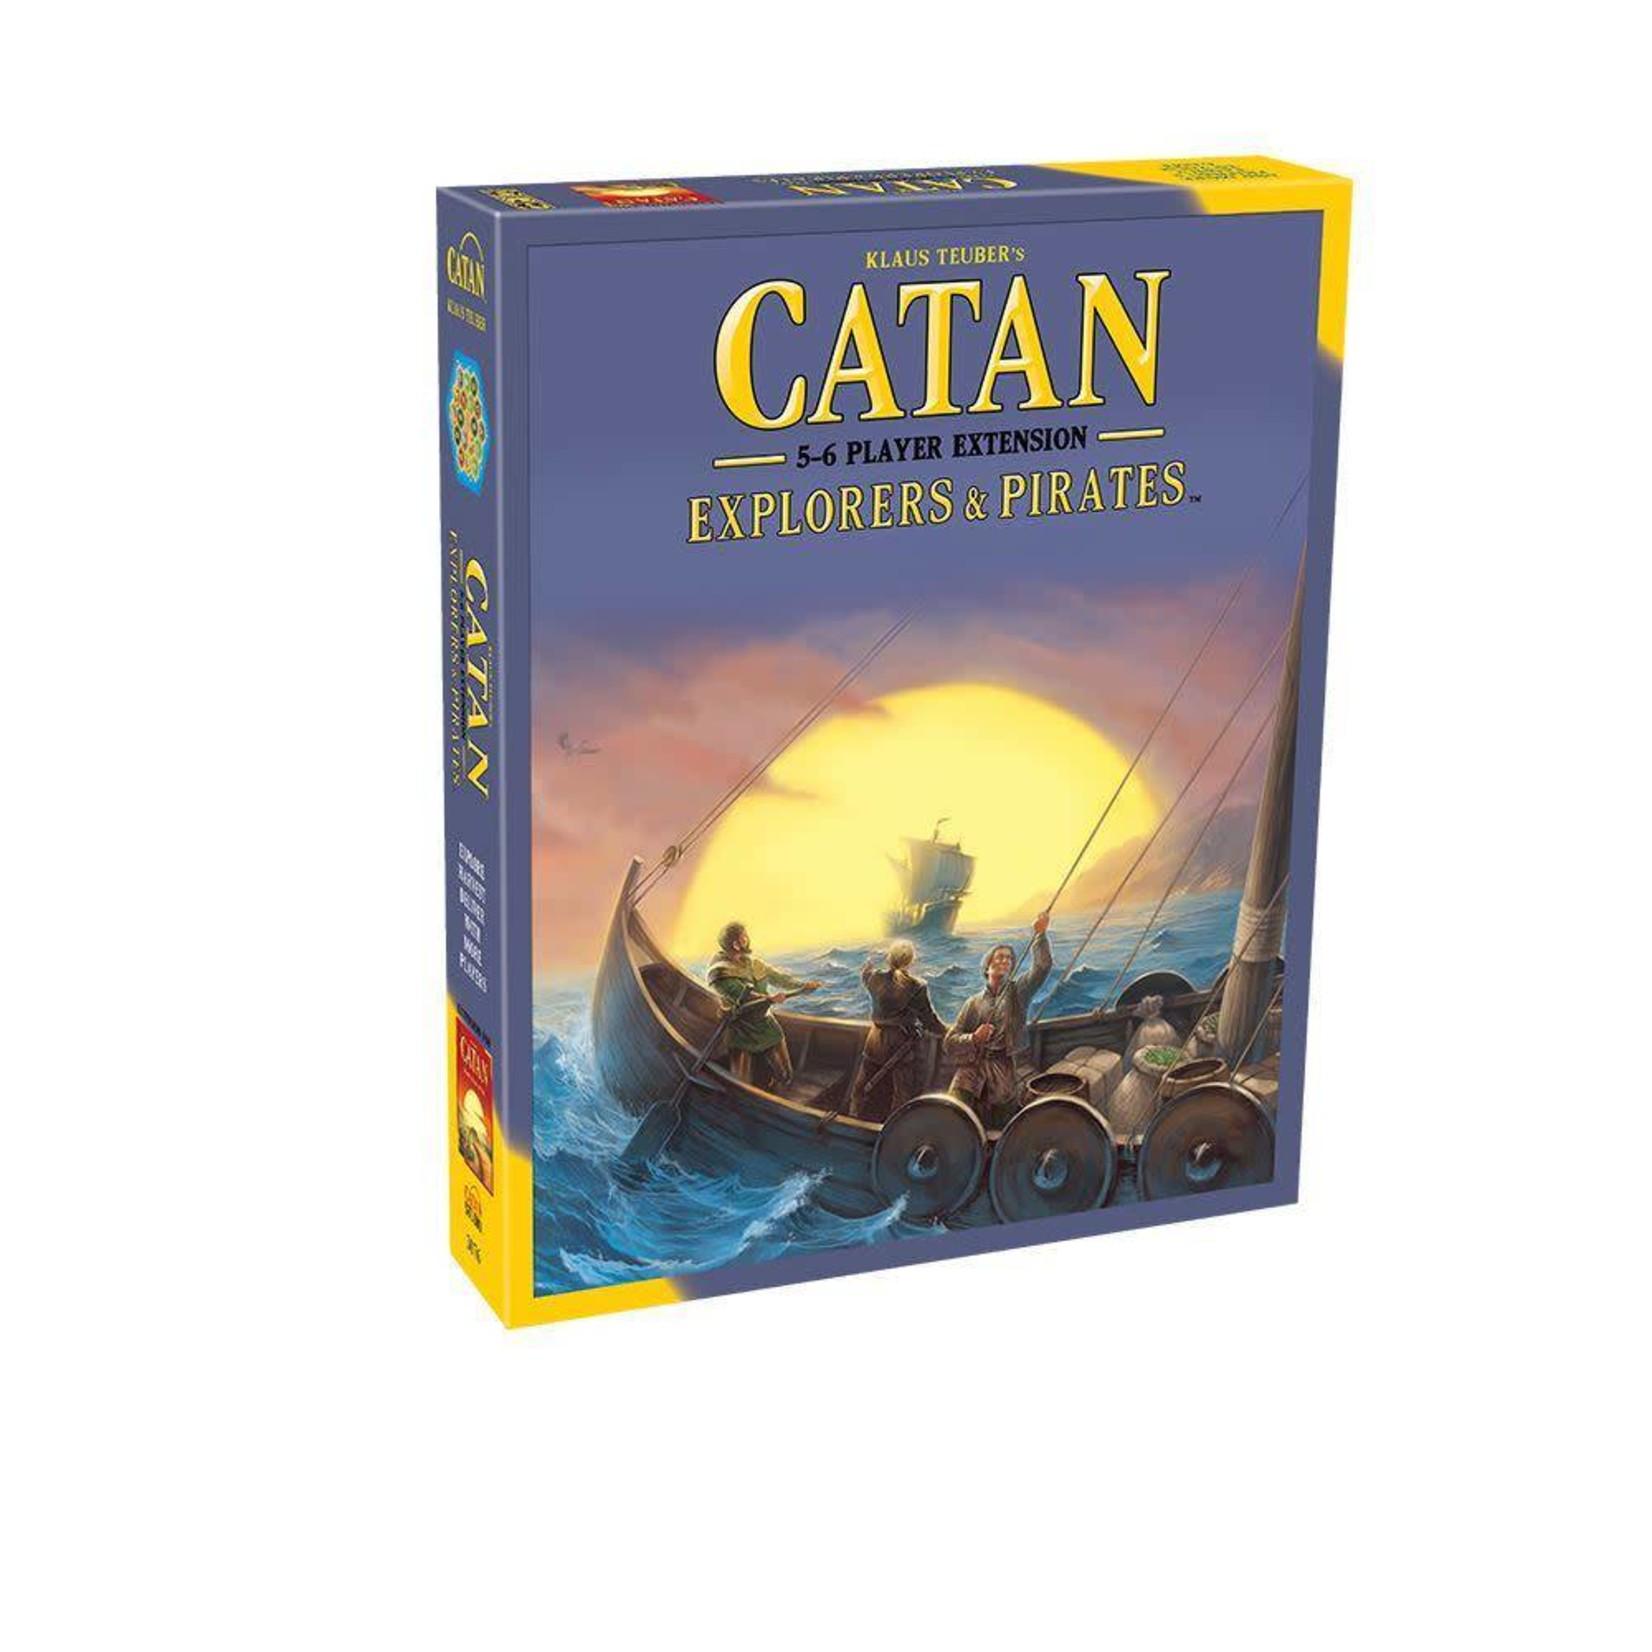 Catan Studios Catan Explorers & Pirates - 5-6 Player Extension